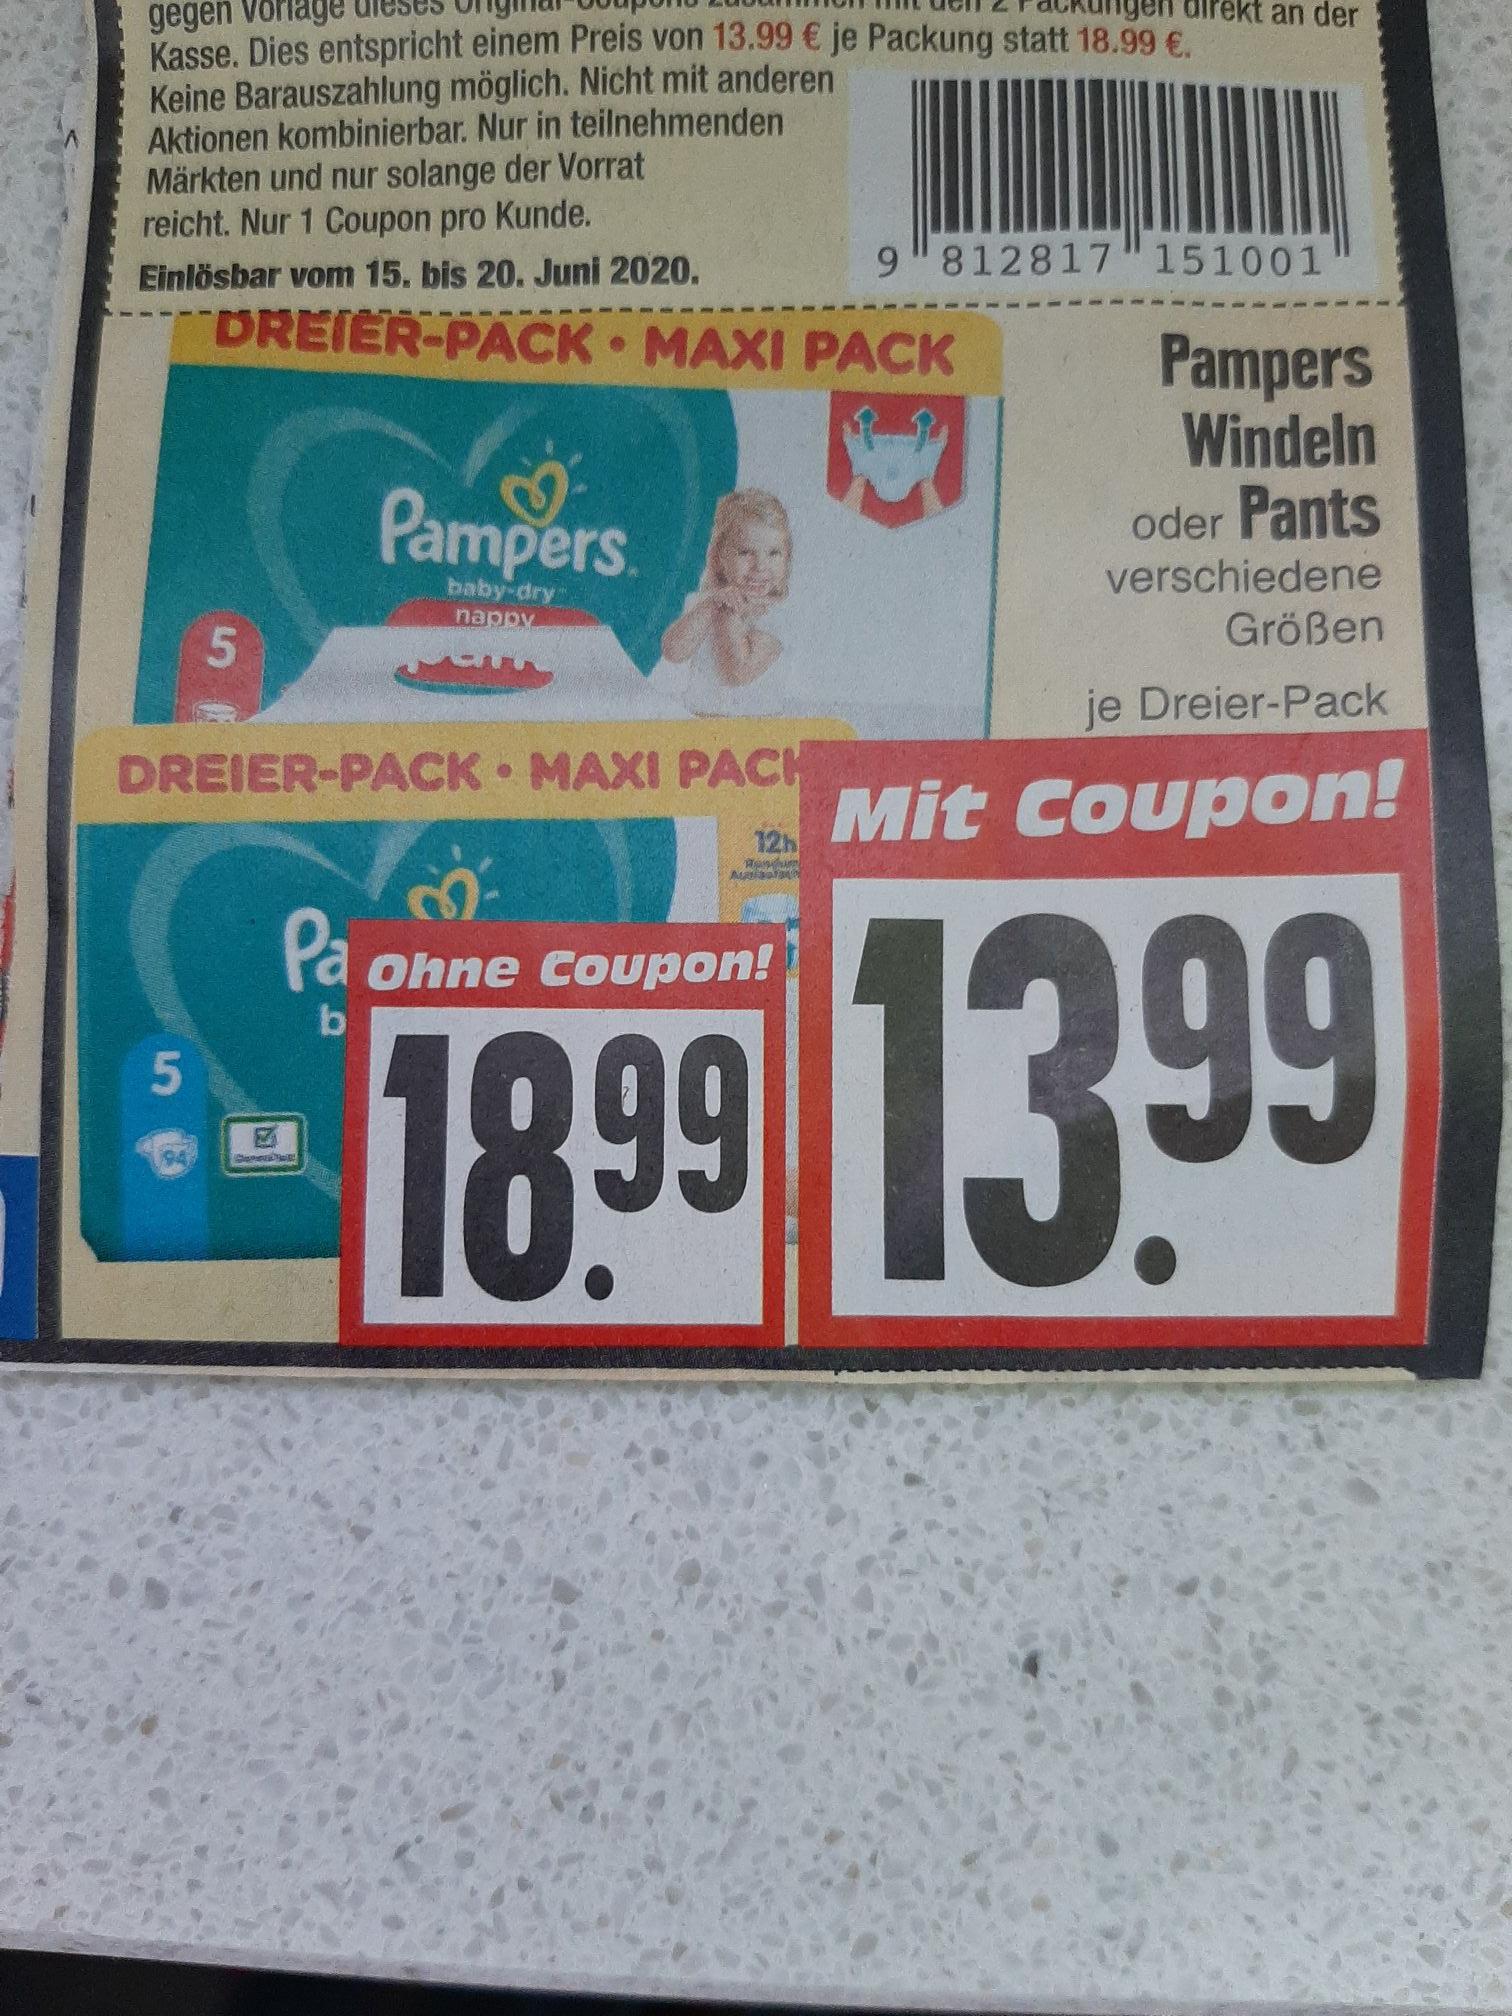 Pampers Babydry Pants / Windeln Edeka 3erPack